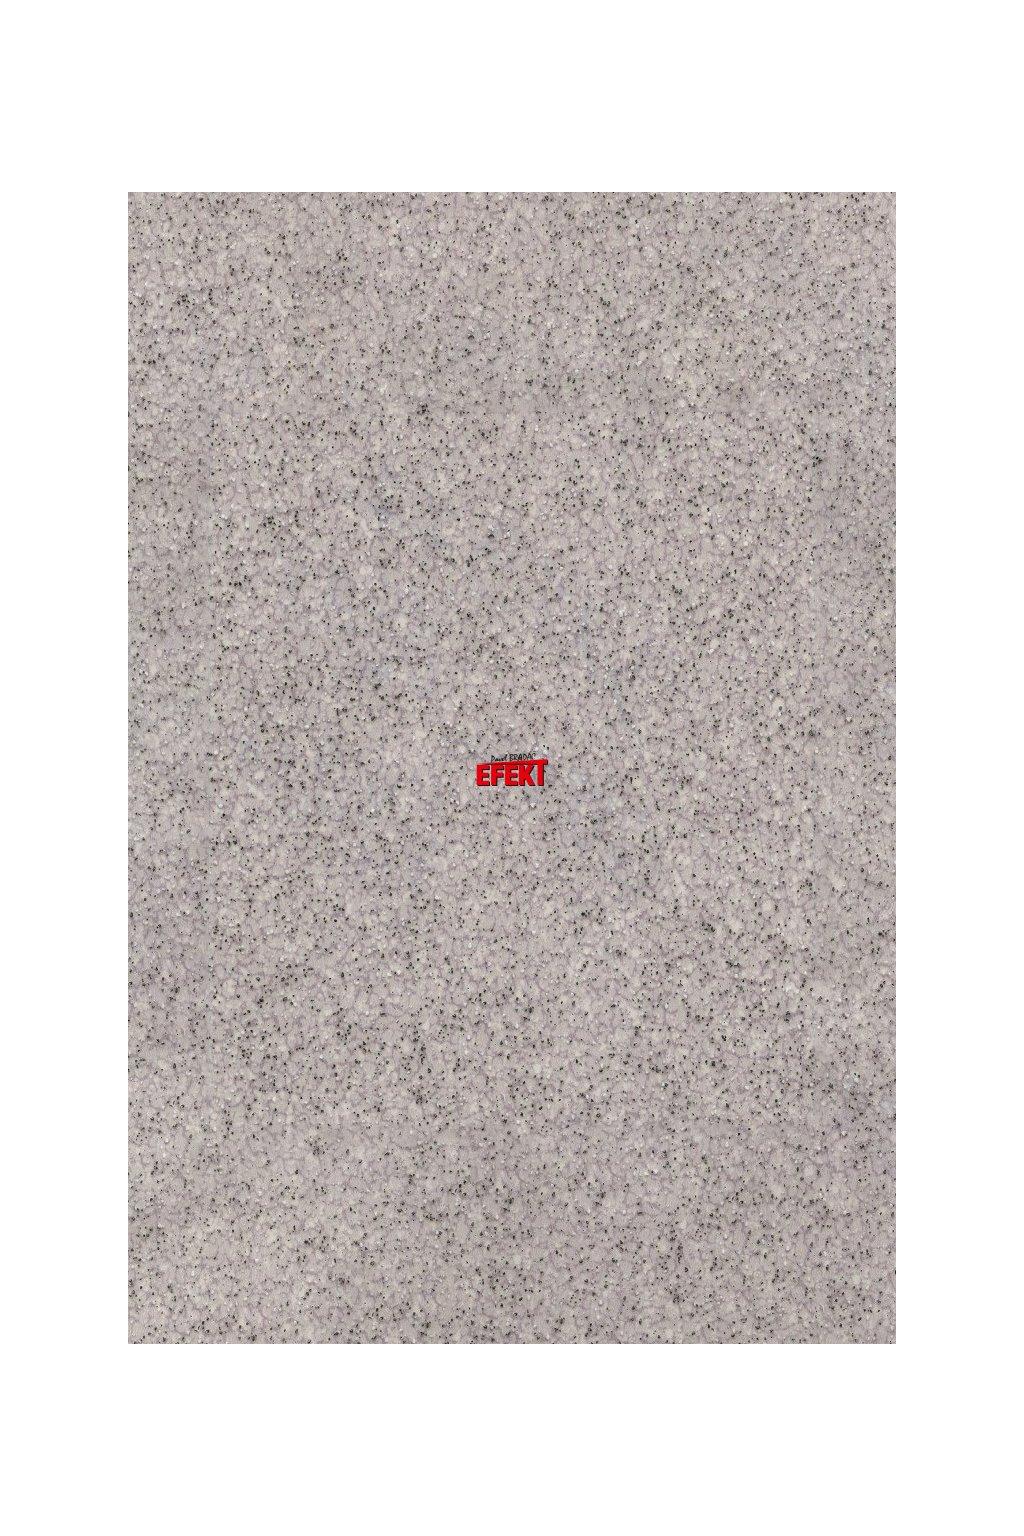 Gerflor Timberline Pixel Silver 0597